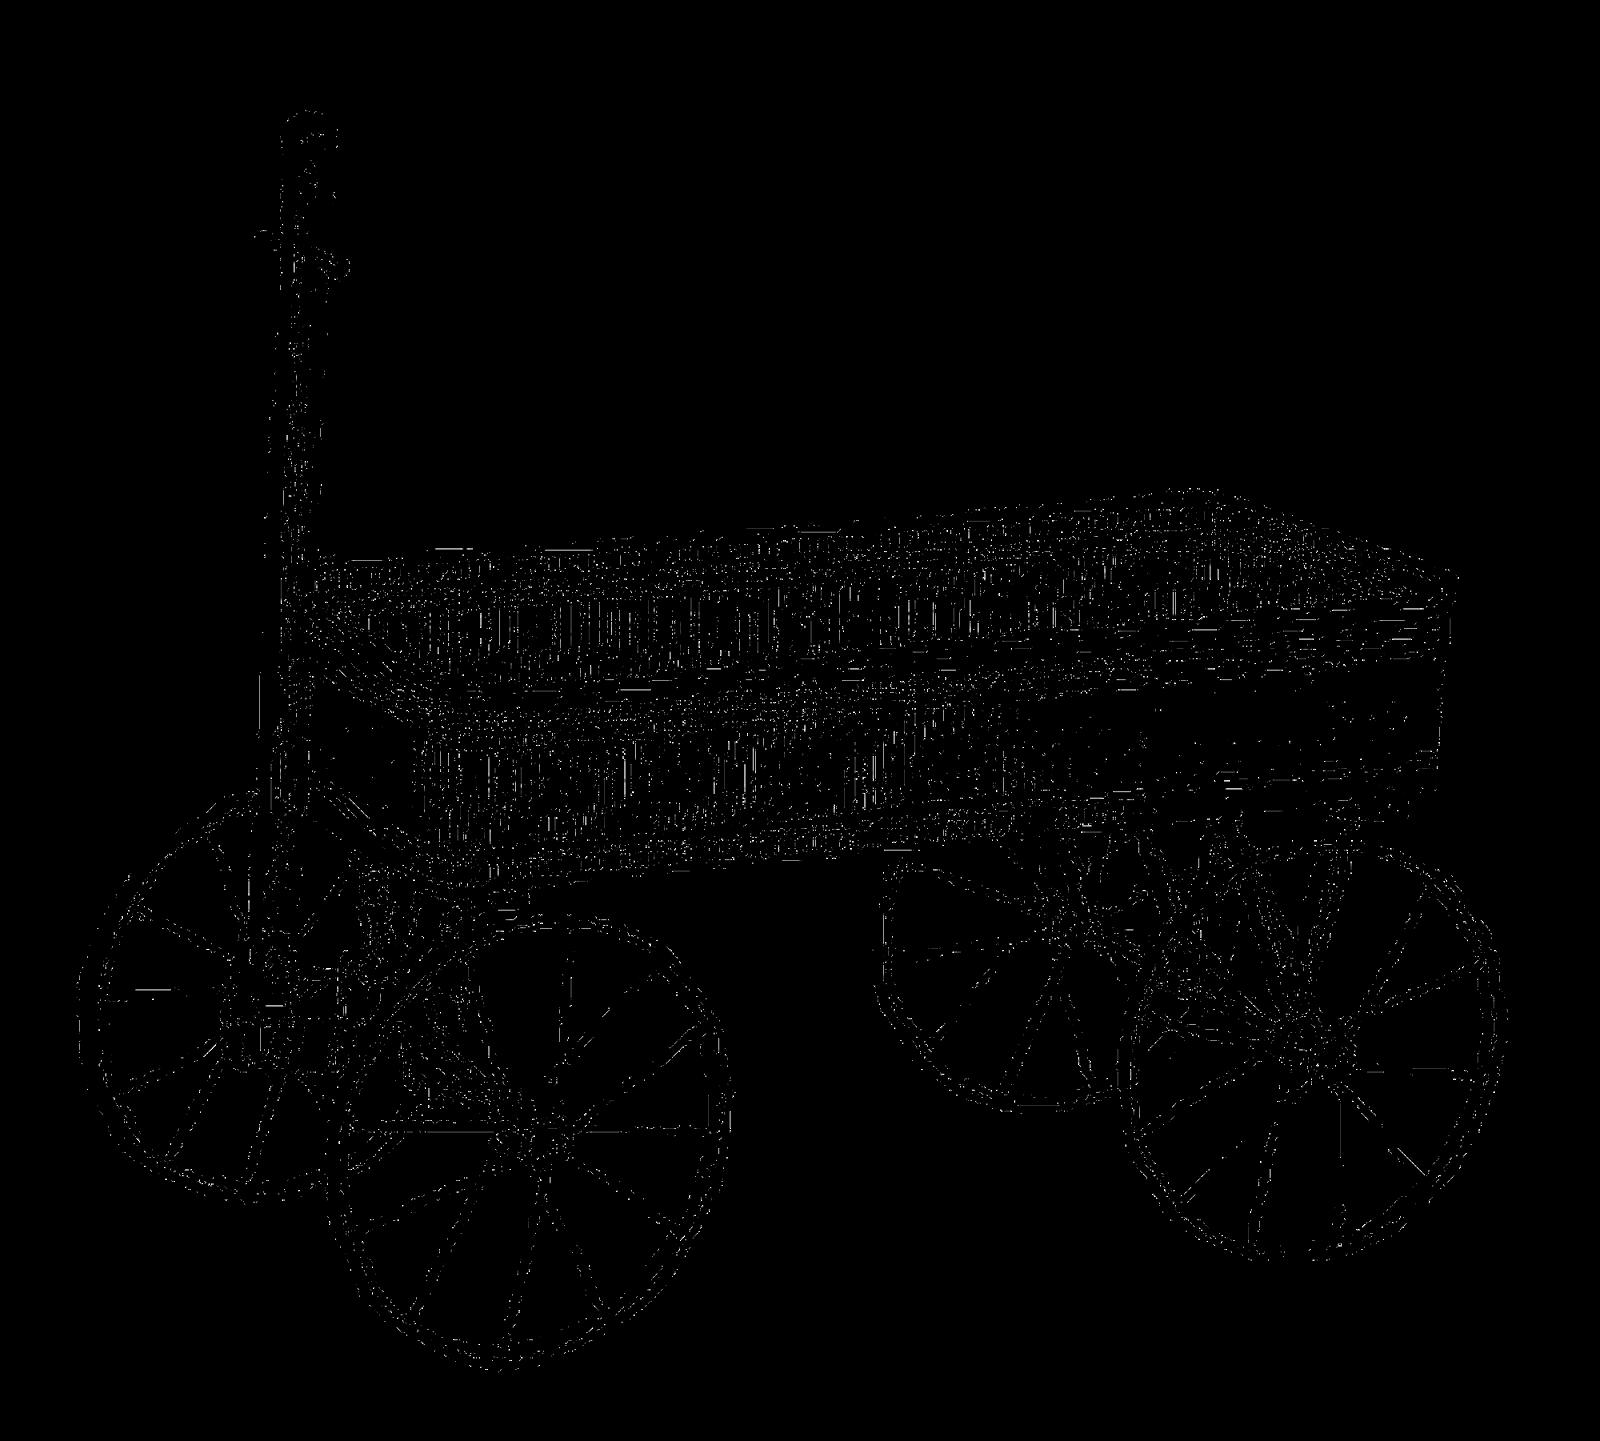 Antique Images Vintage Toy Wagon Digital Clip Art Image